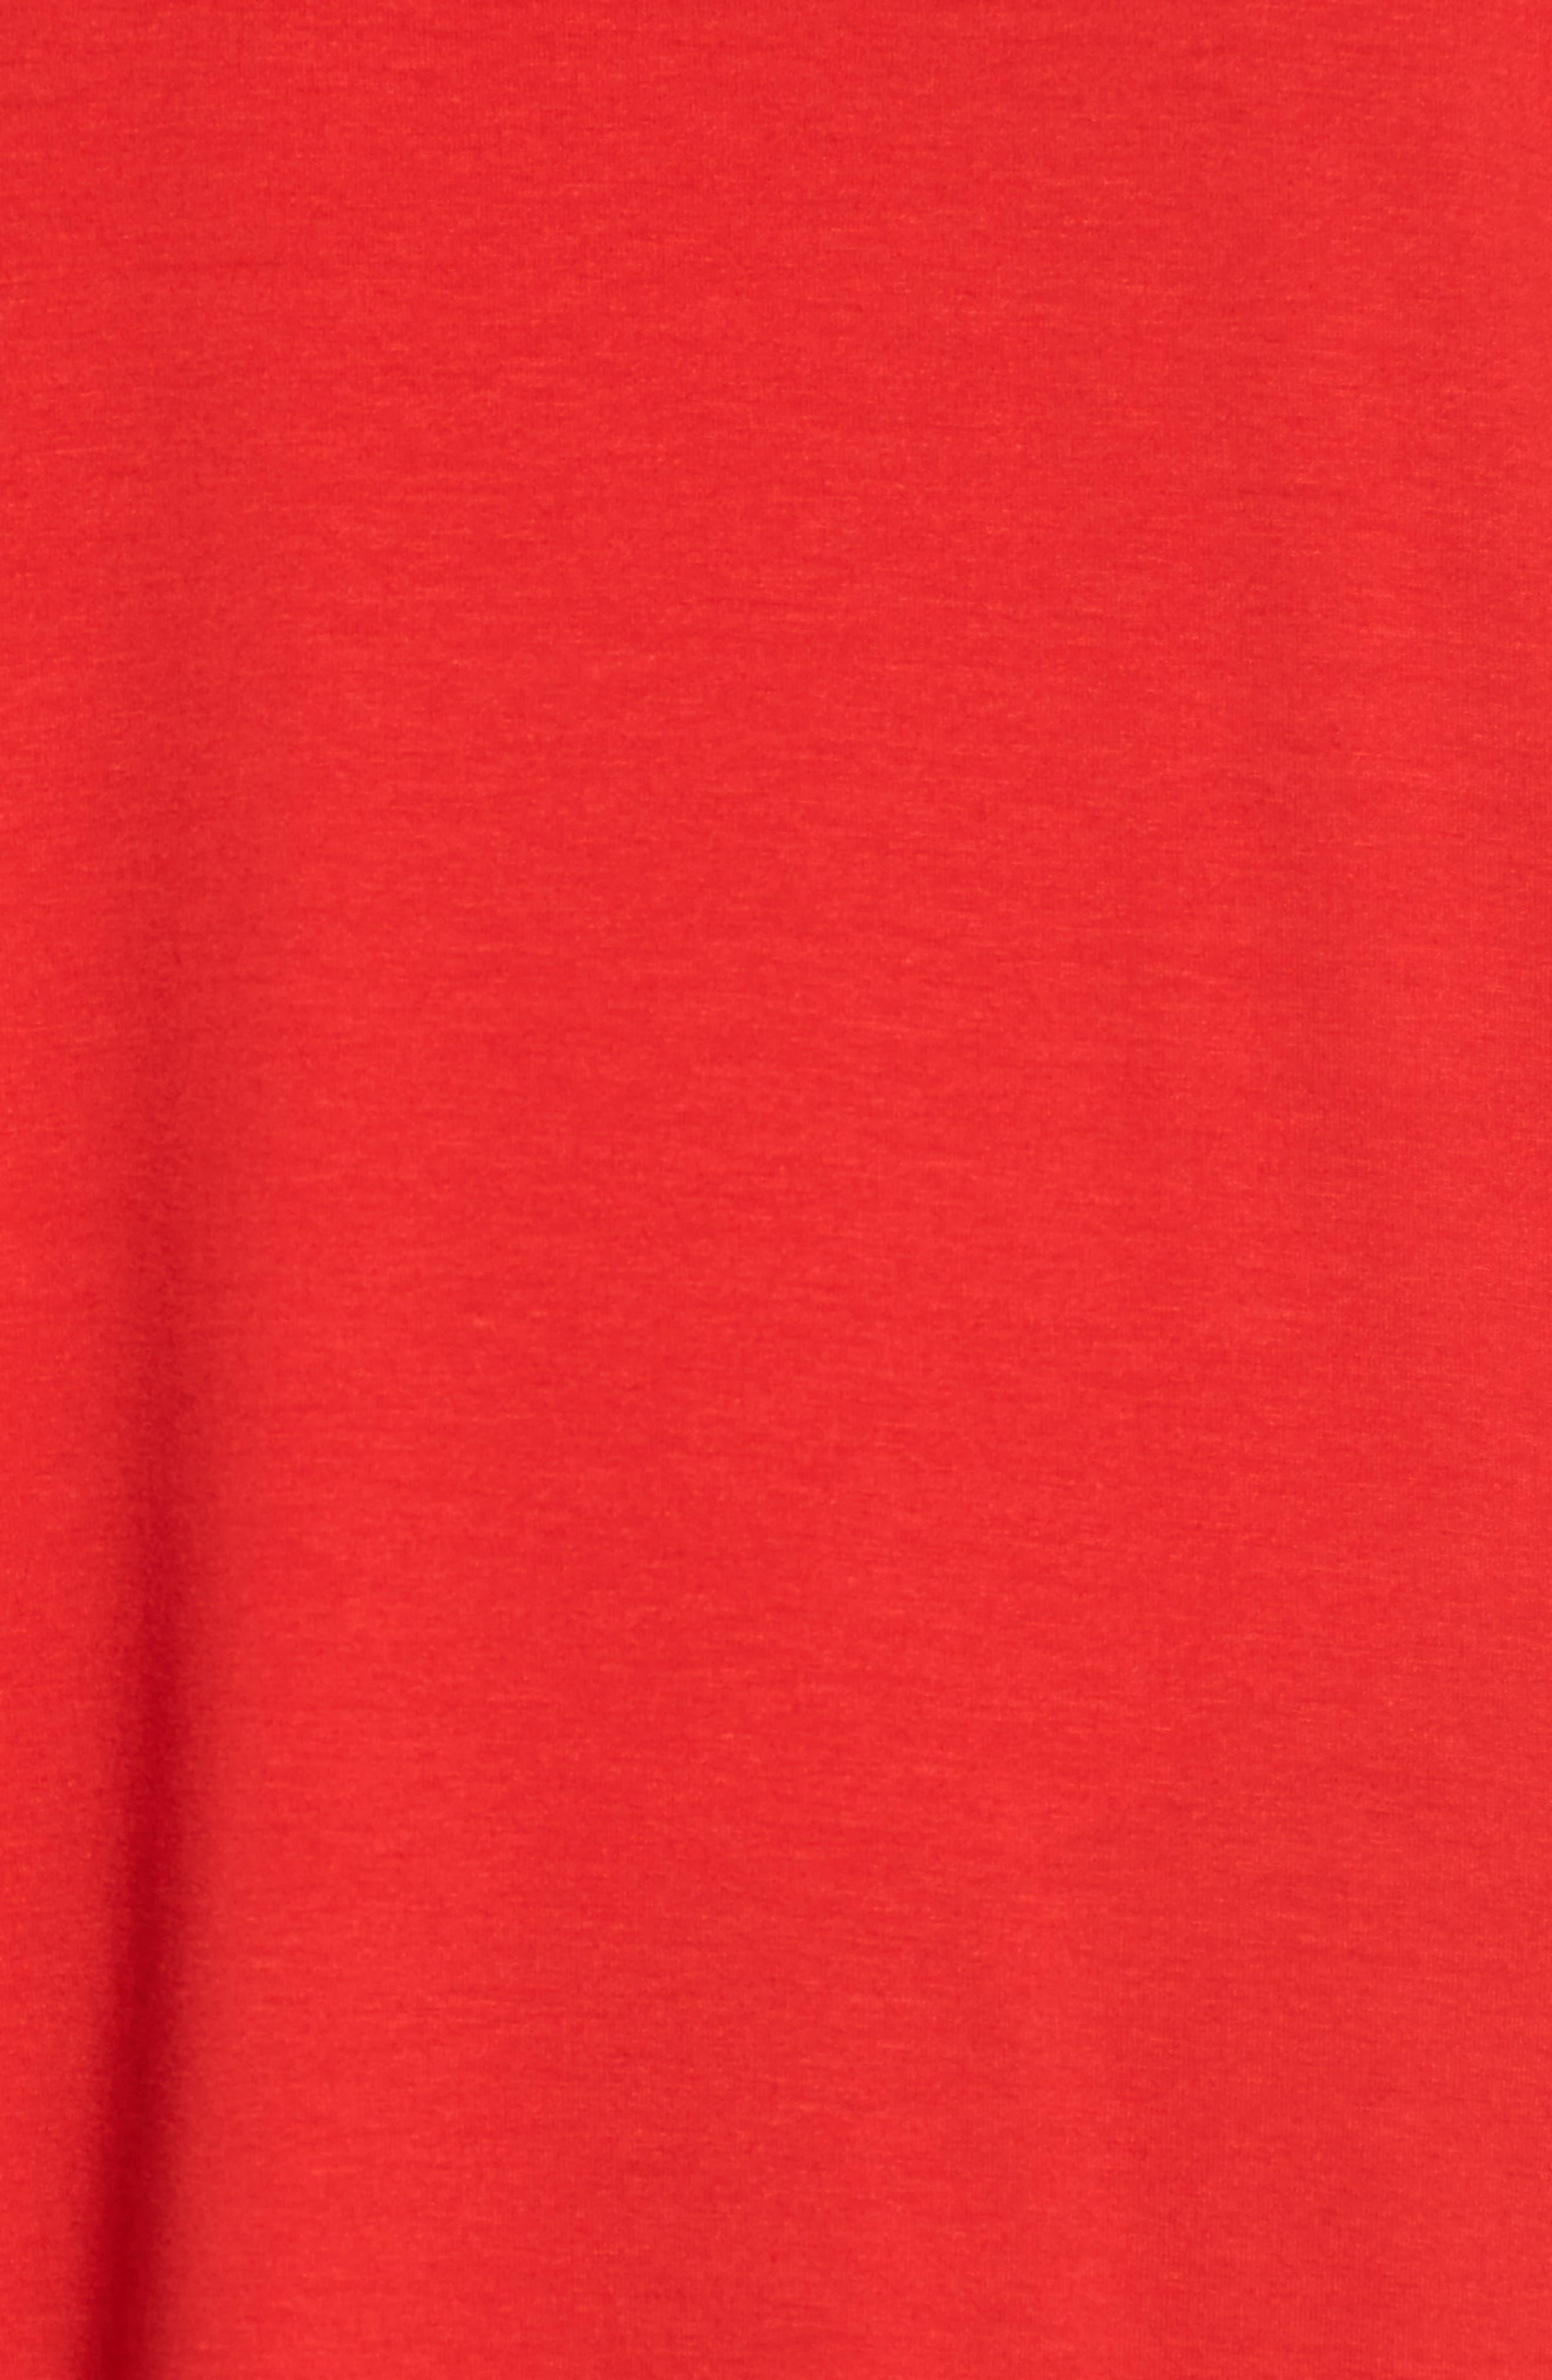 Jersey Tunic,                             Alternate thumbnail 10, color,